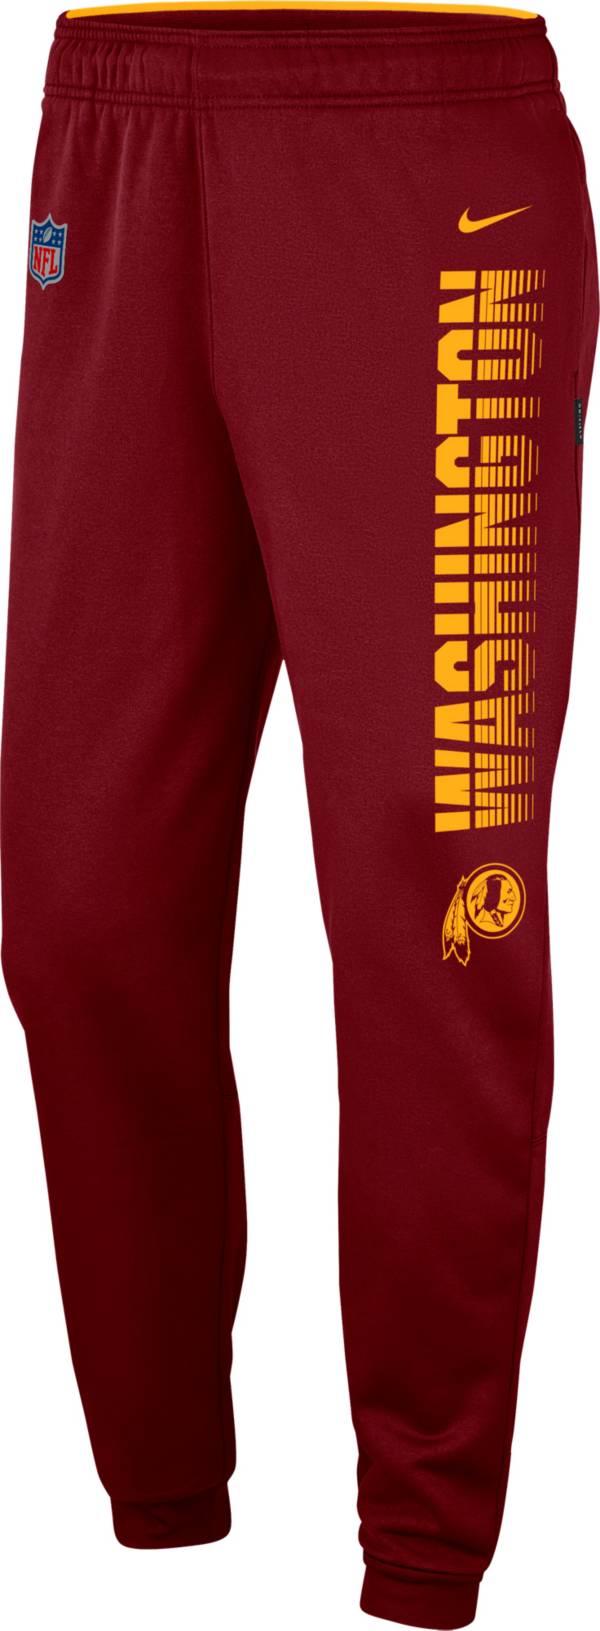 Nike Men's Washington Redskins Sideline Therma-FIT Performance Red Pants product image